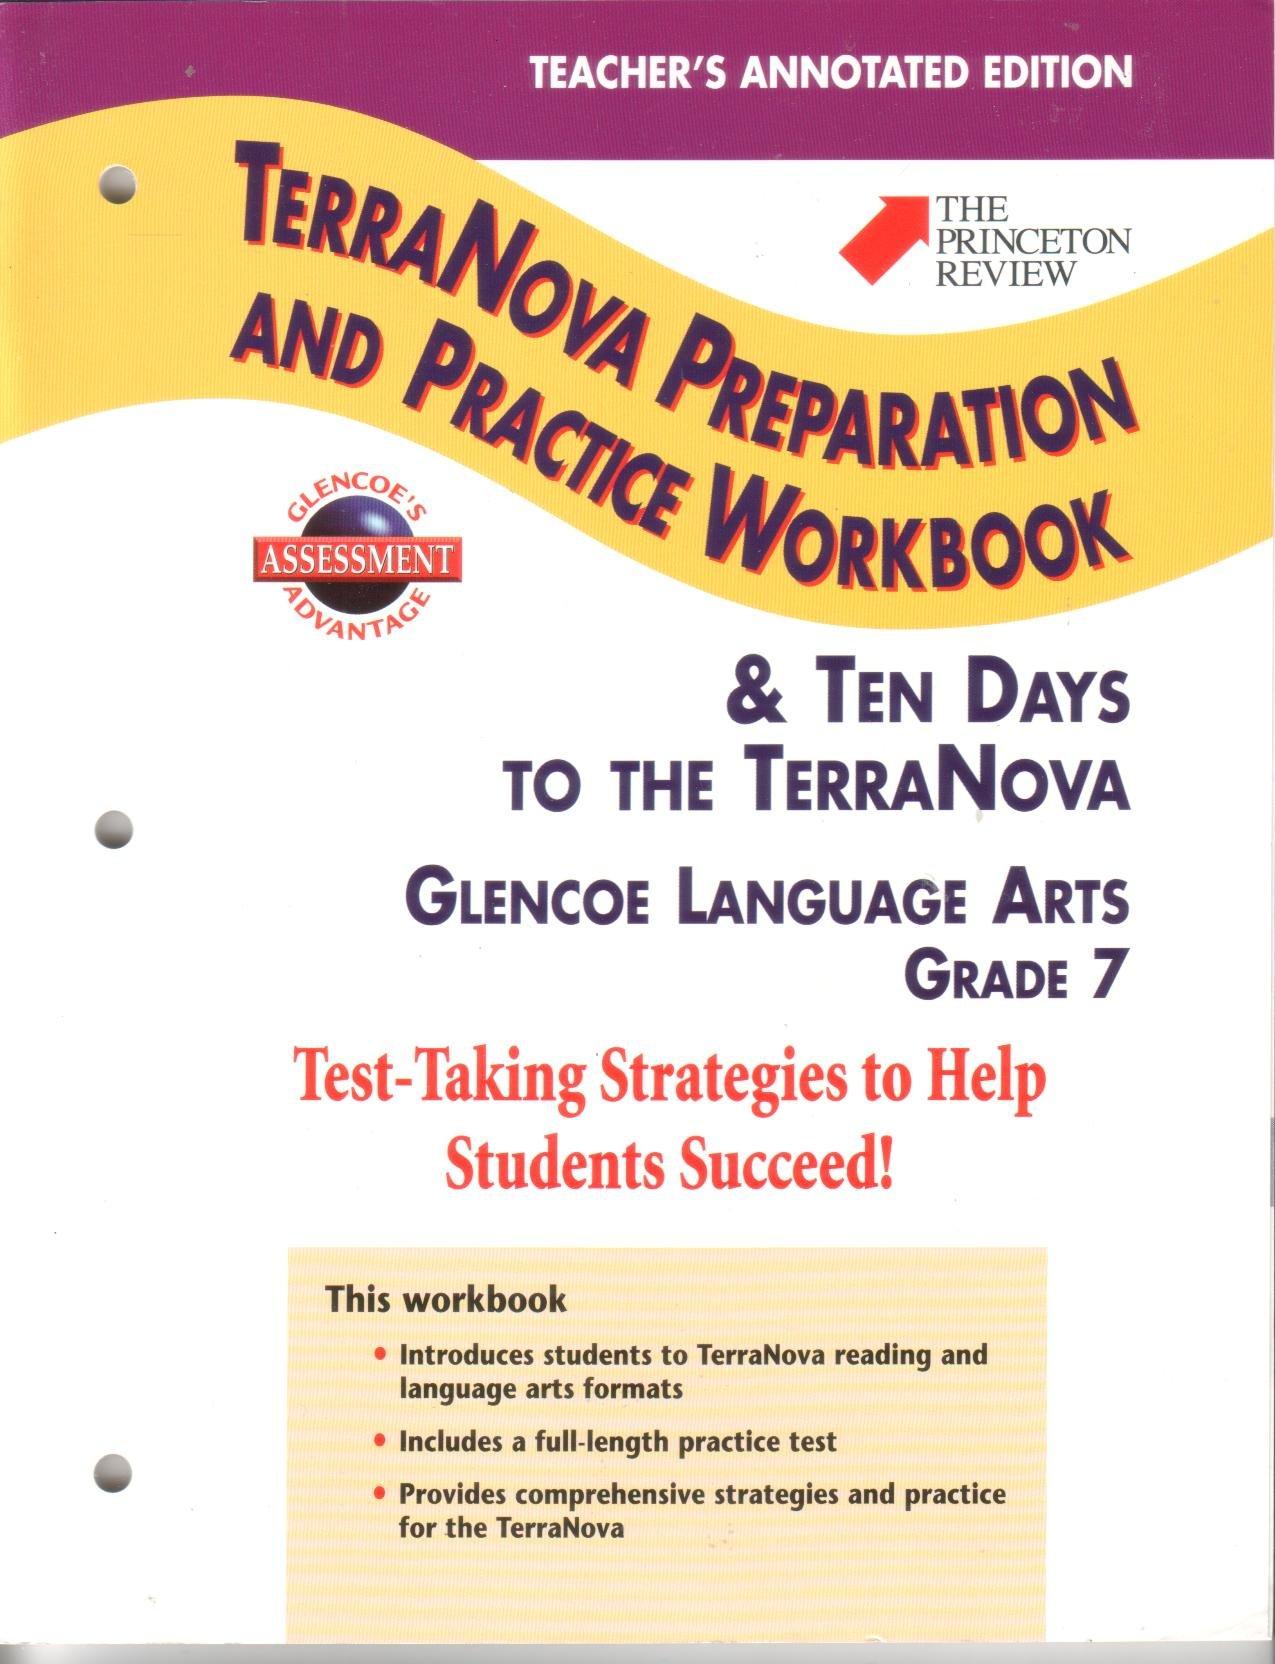 TerraNova Preparation and Practice Workbook & Ten Days to the TerraNova,  Grade 7, Teacher's Annotated Edition (Glencoe Language Arts): Glencoe: ...